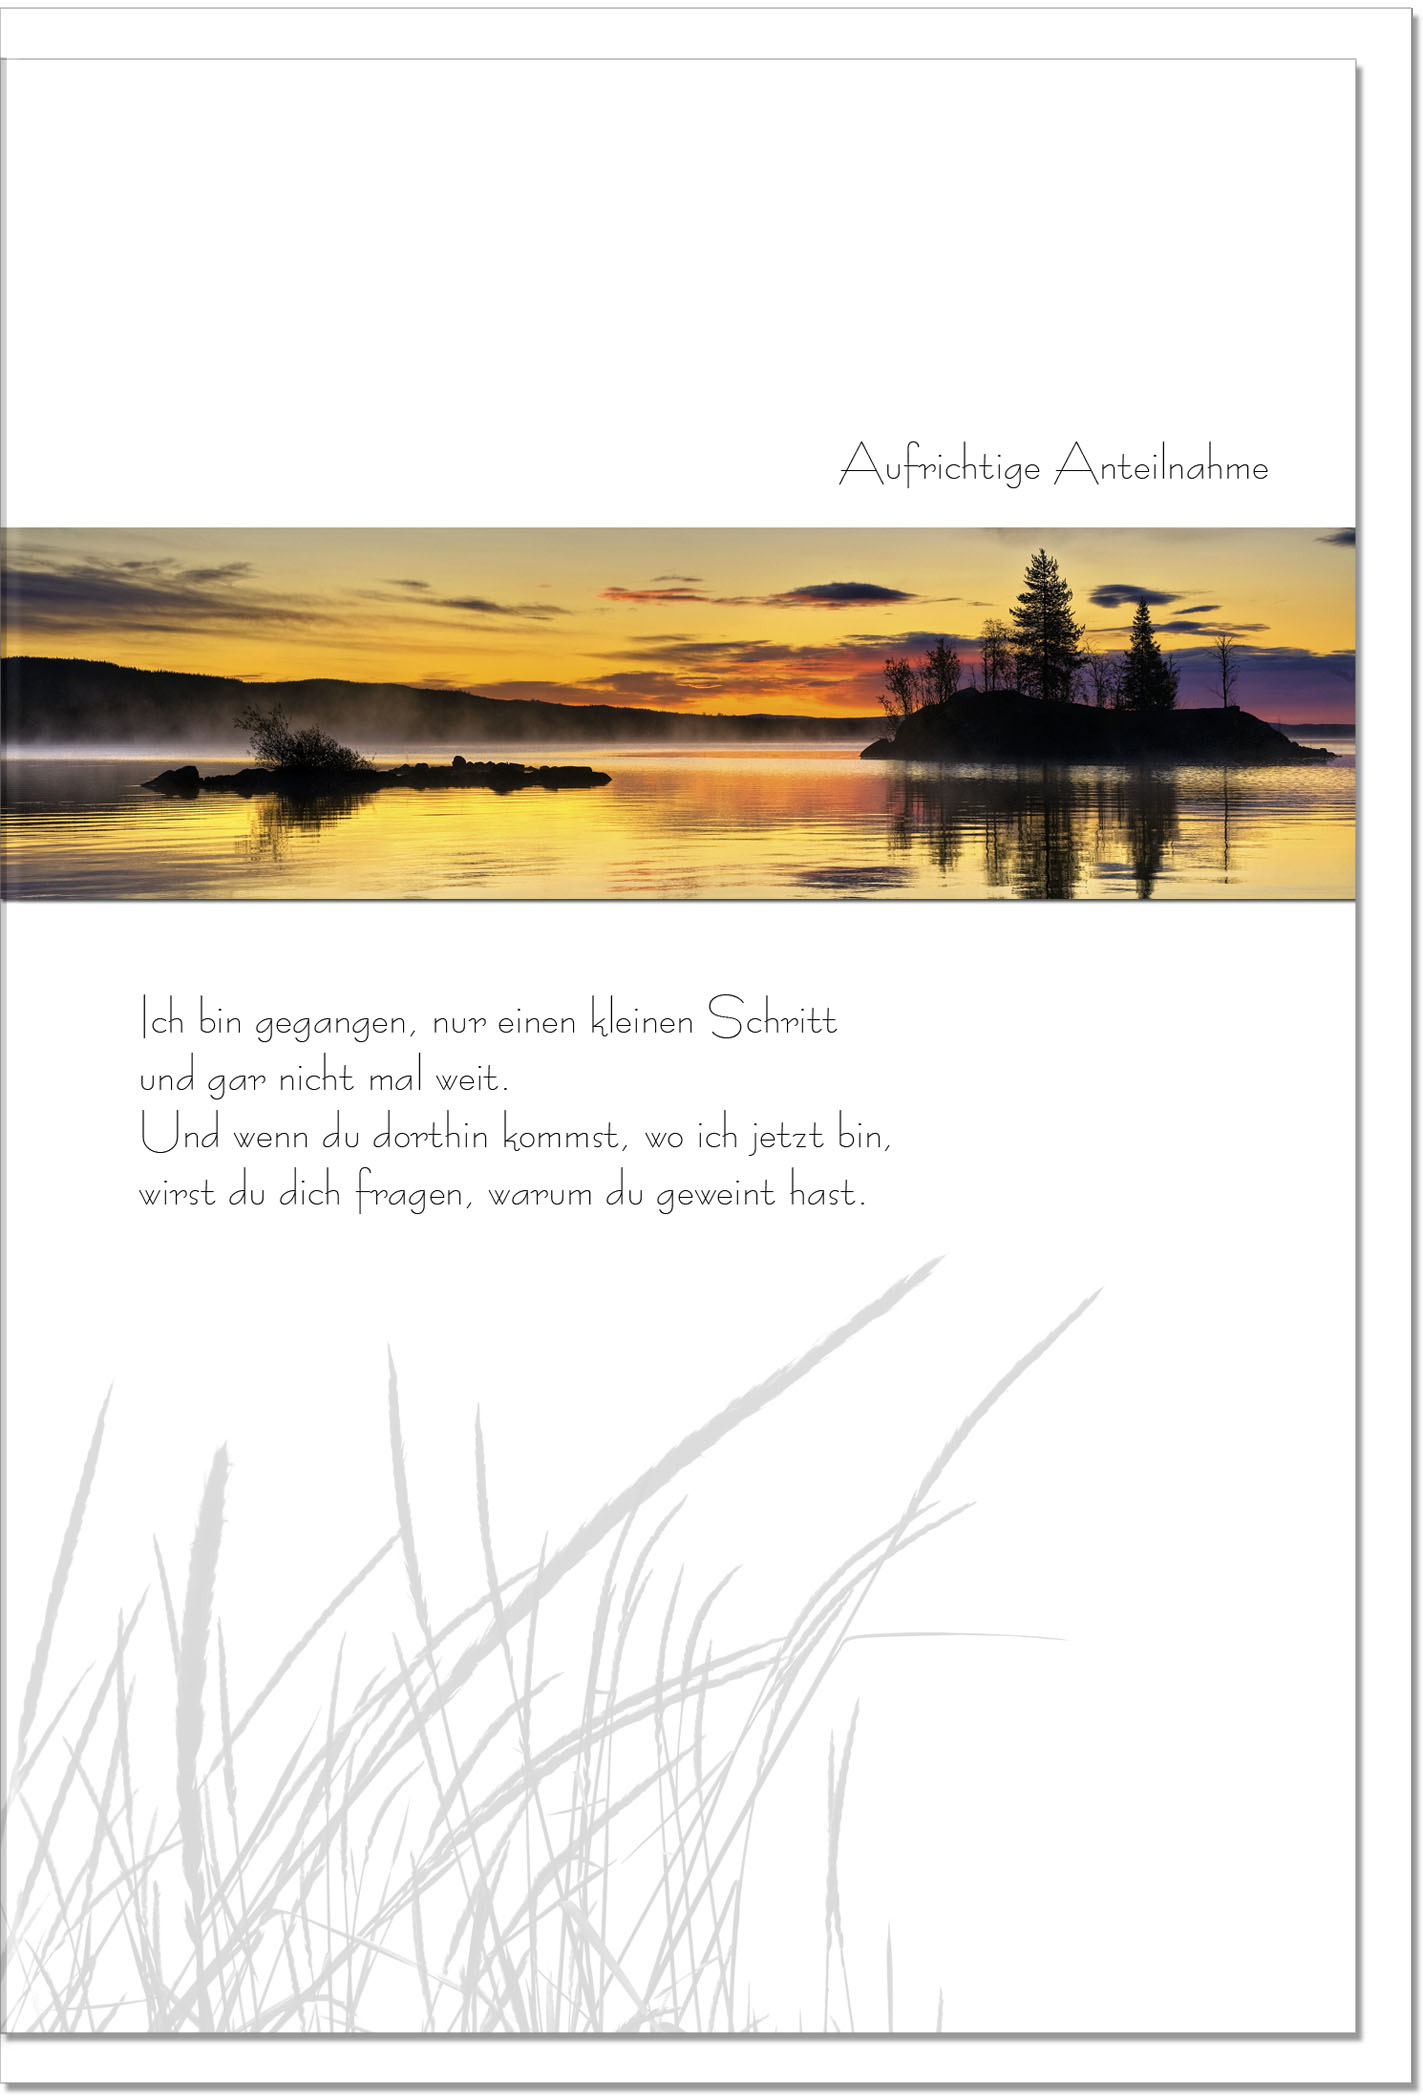 Kondolenzkarte VORAUSGEGANGEN | Sonnenuntergang | metALUm #00076